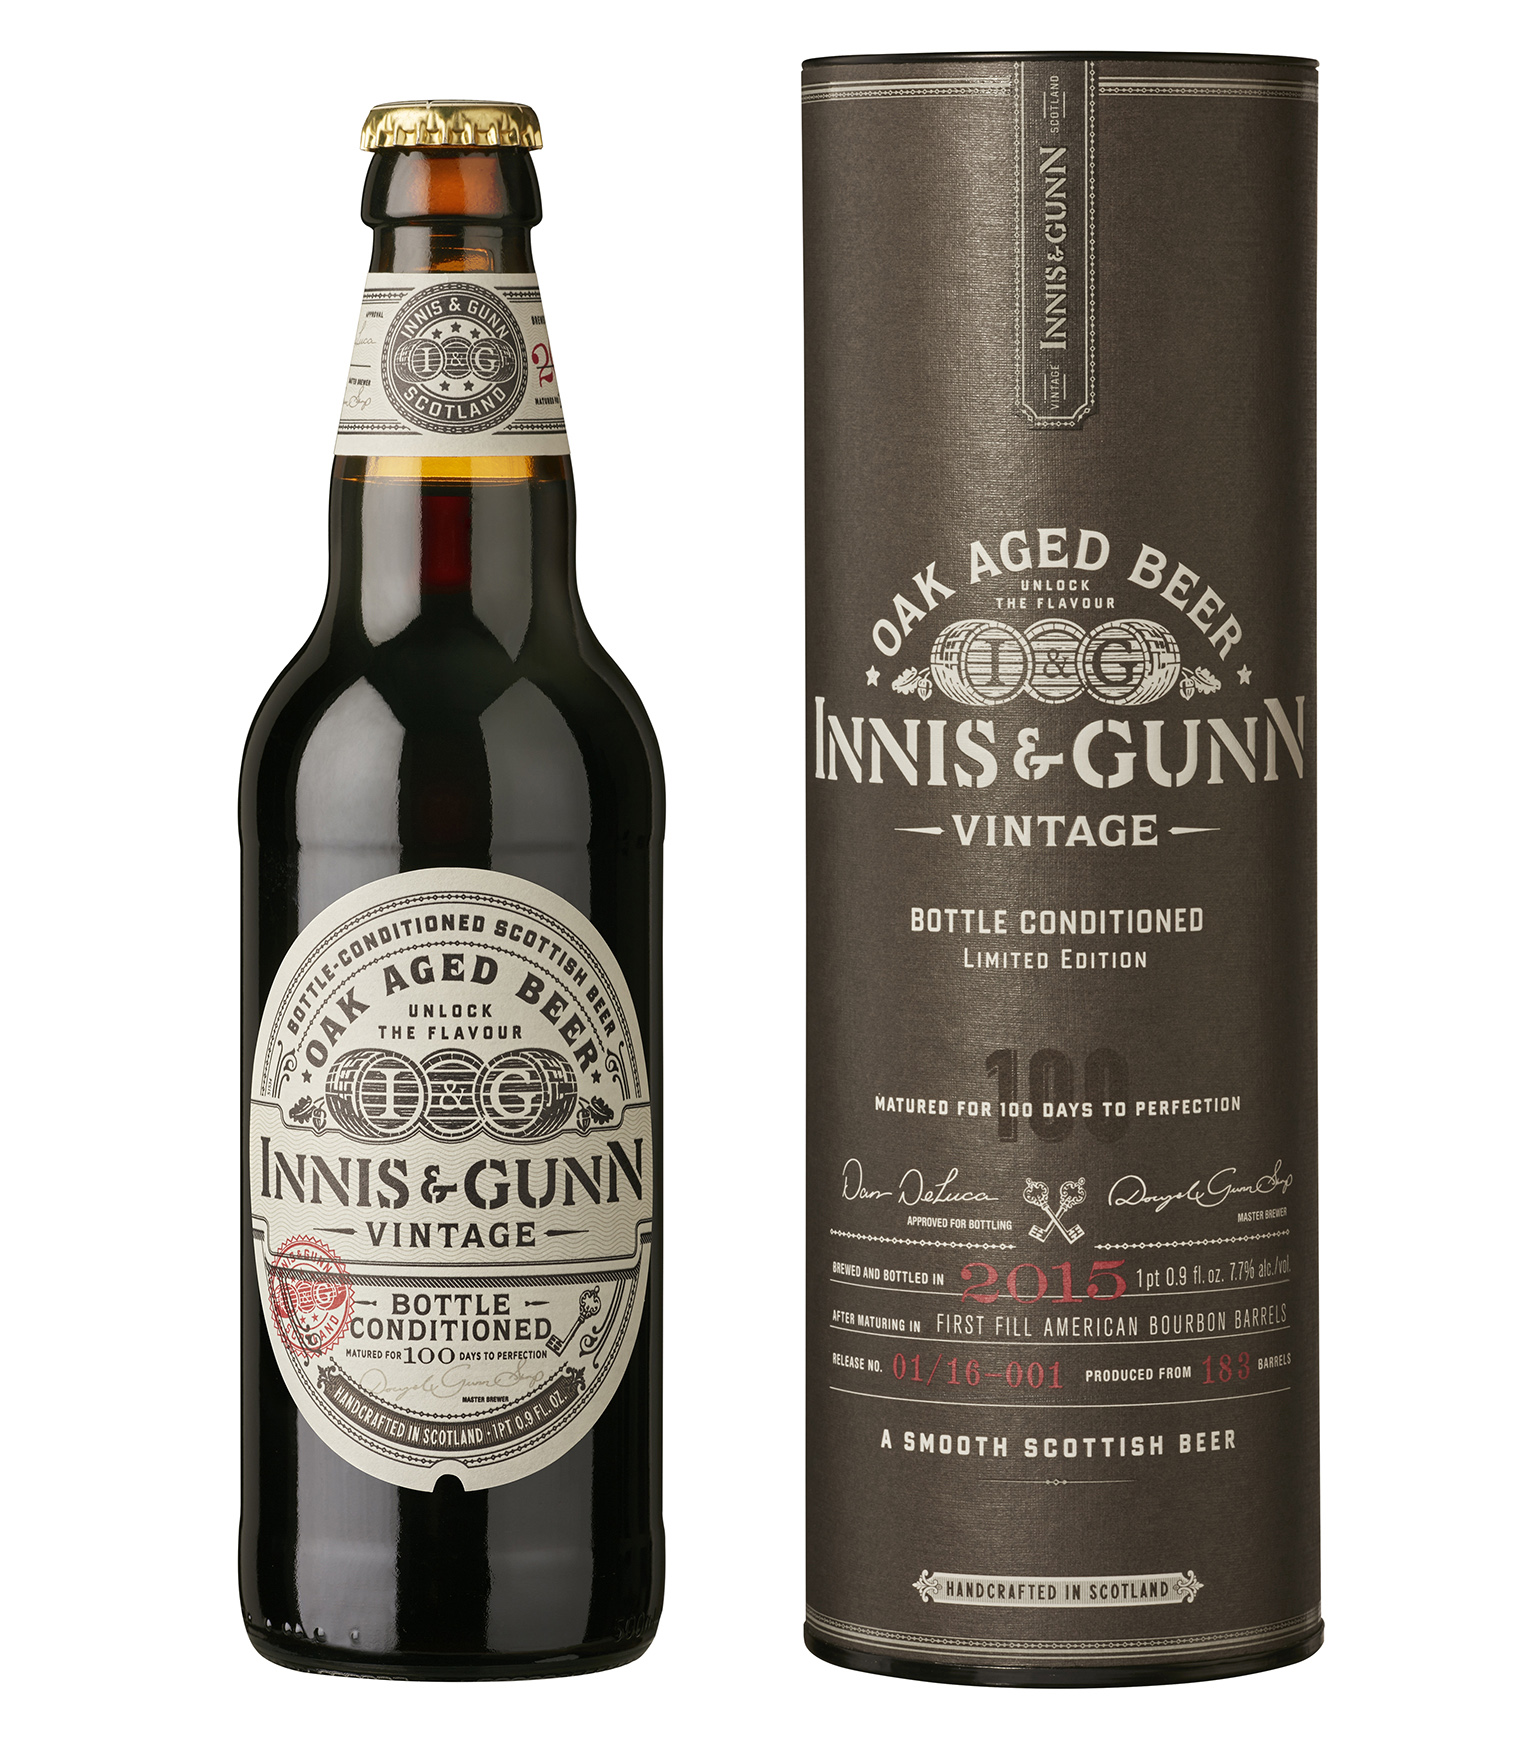 Innis Amp Gunn Releases New Barrel Aged Vintage Ale